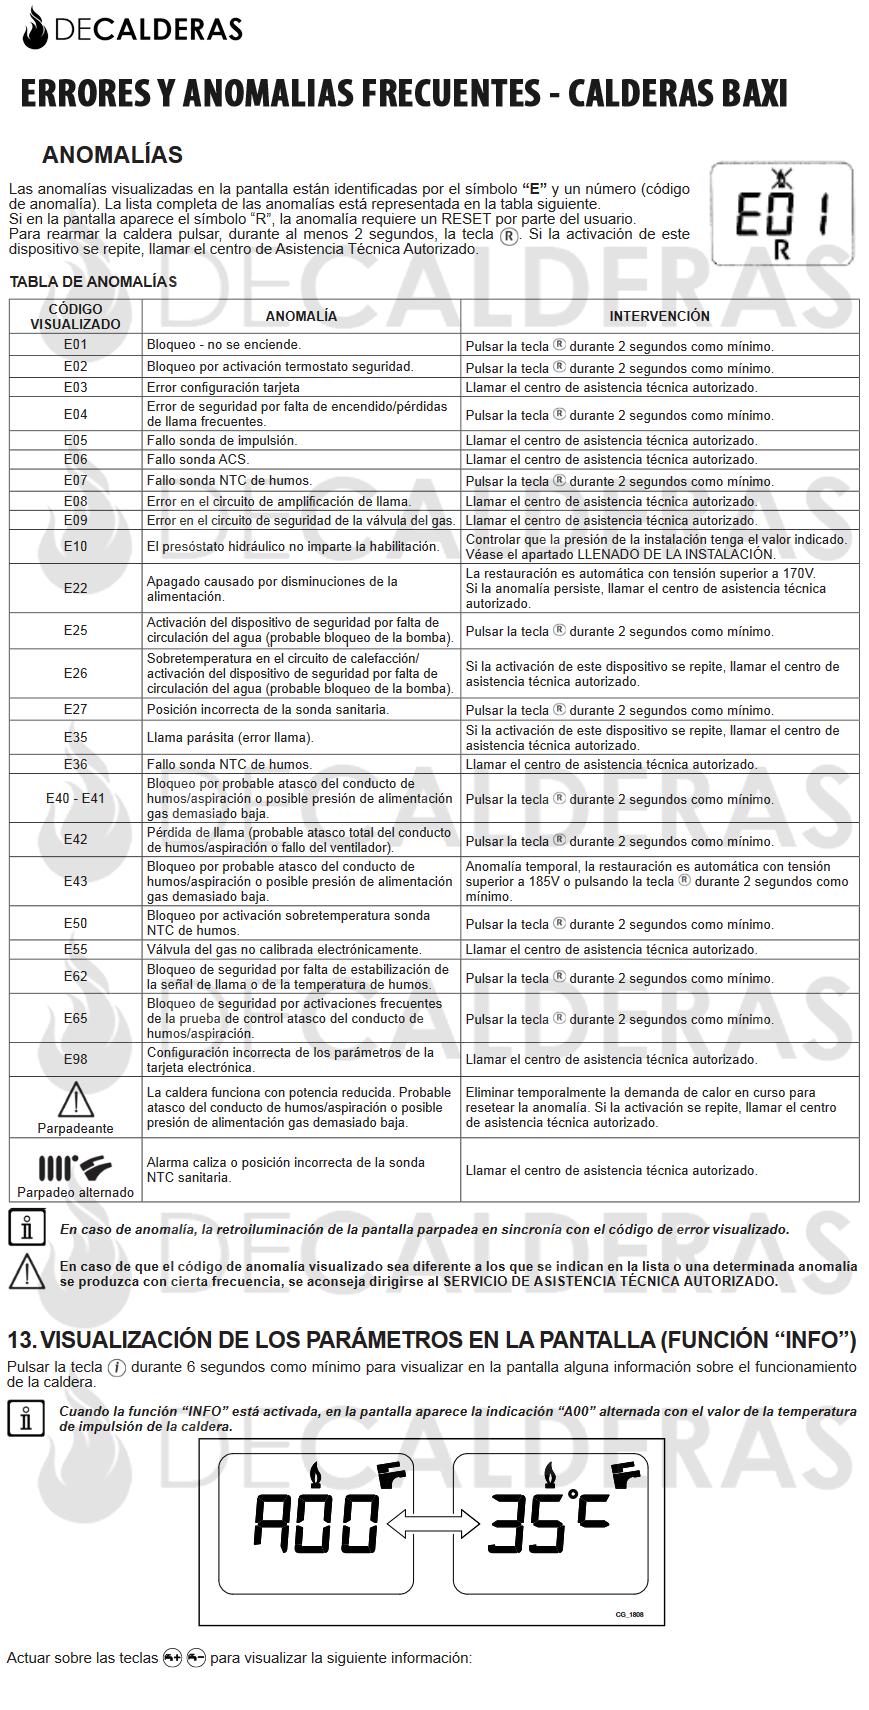 tabla-errores-calderas-baxi